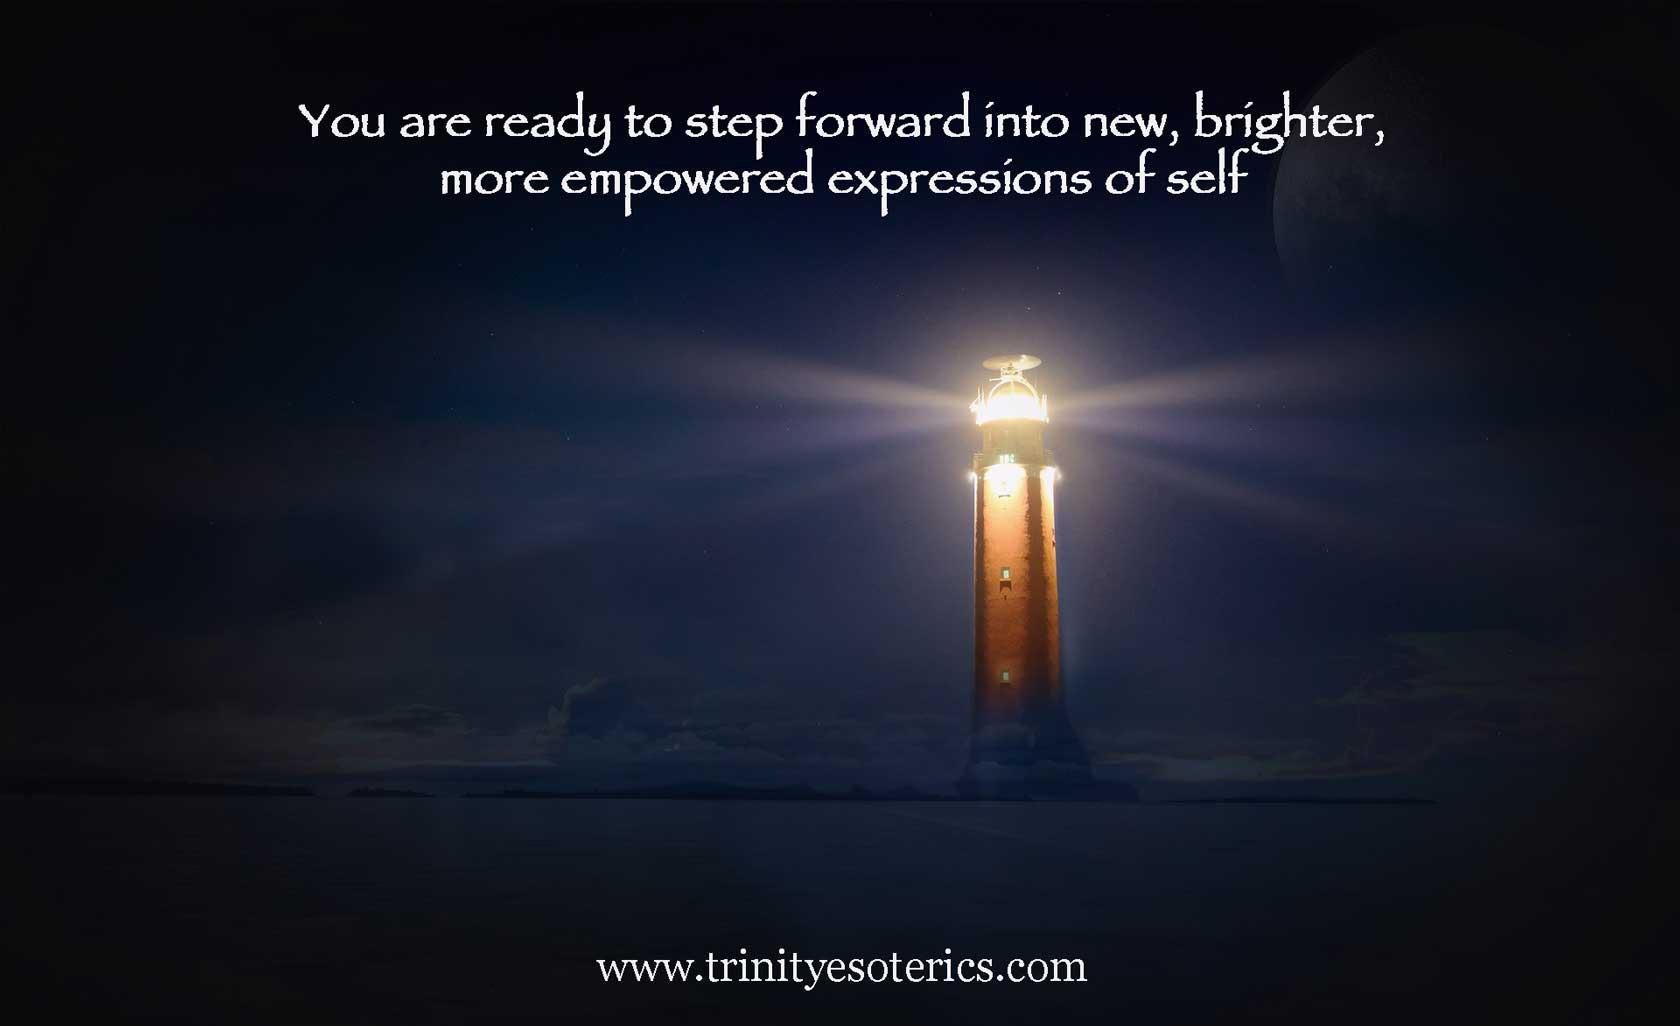 shining lighthouse trinity esoterics